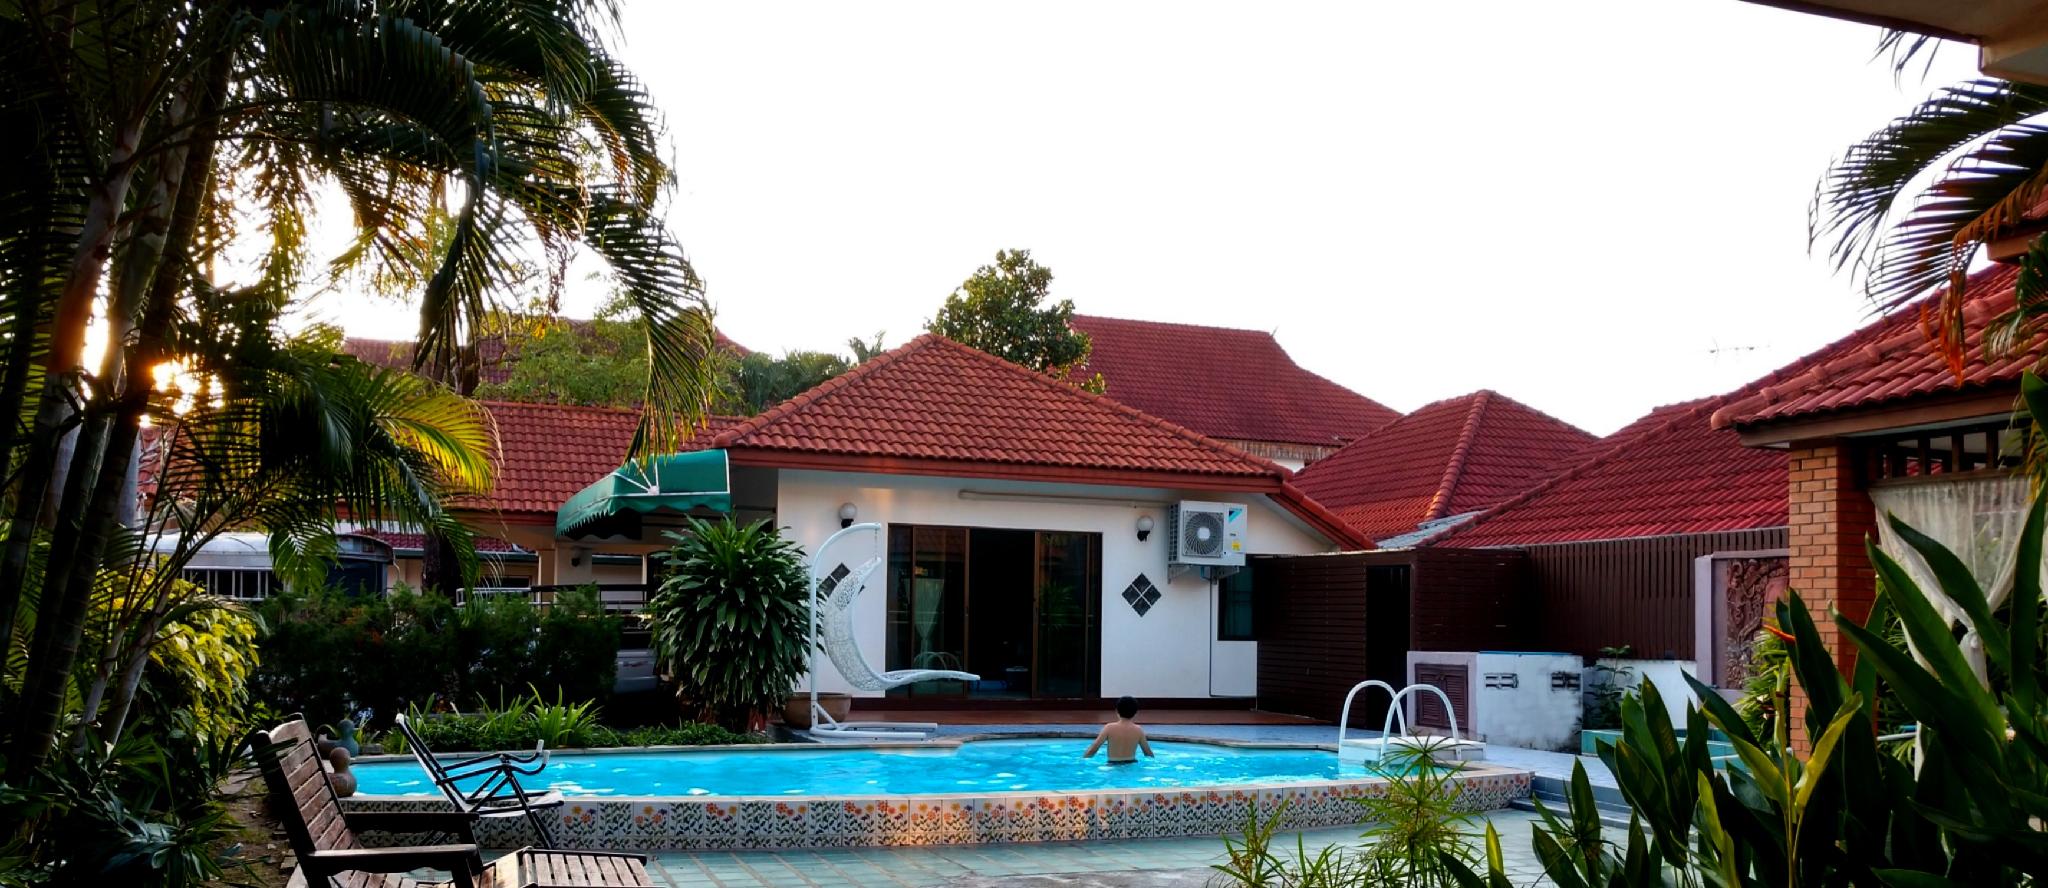 Modern amenities, free shuttle and private pool! บังกะโล 1 ห้องนอน 1 ห้องน้ำส่วนตัว ขนาด 55 ตร.ม. – สันทราย